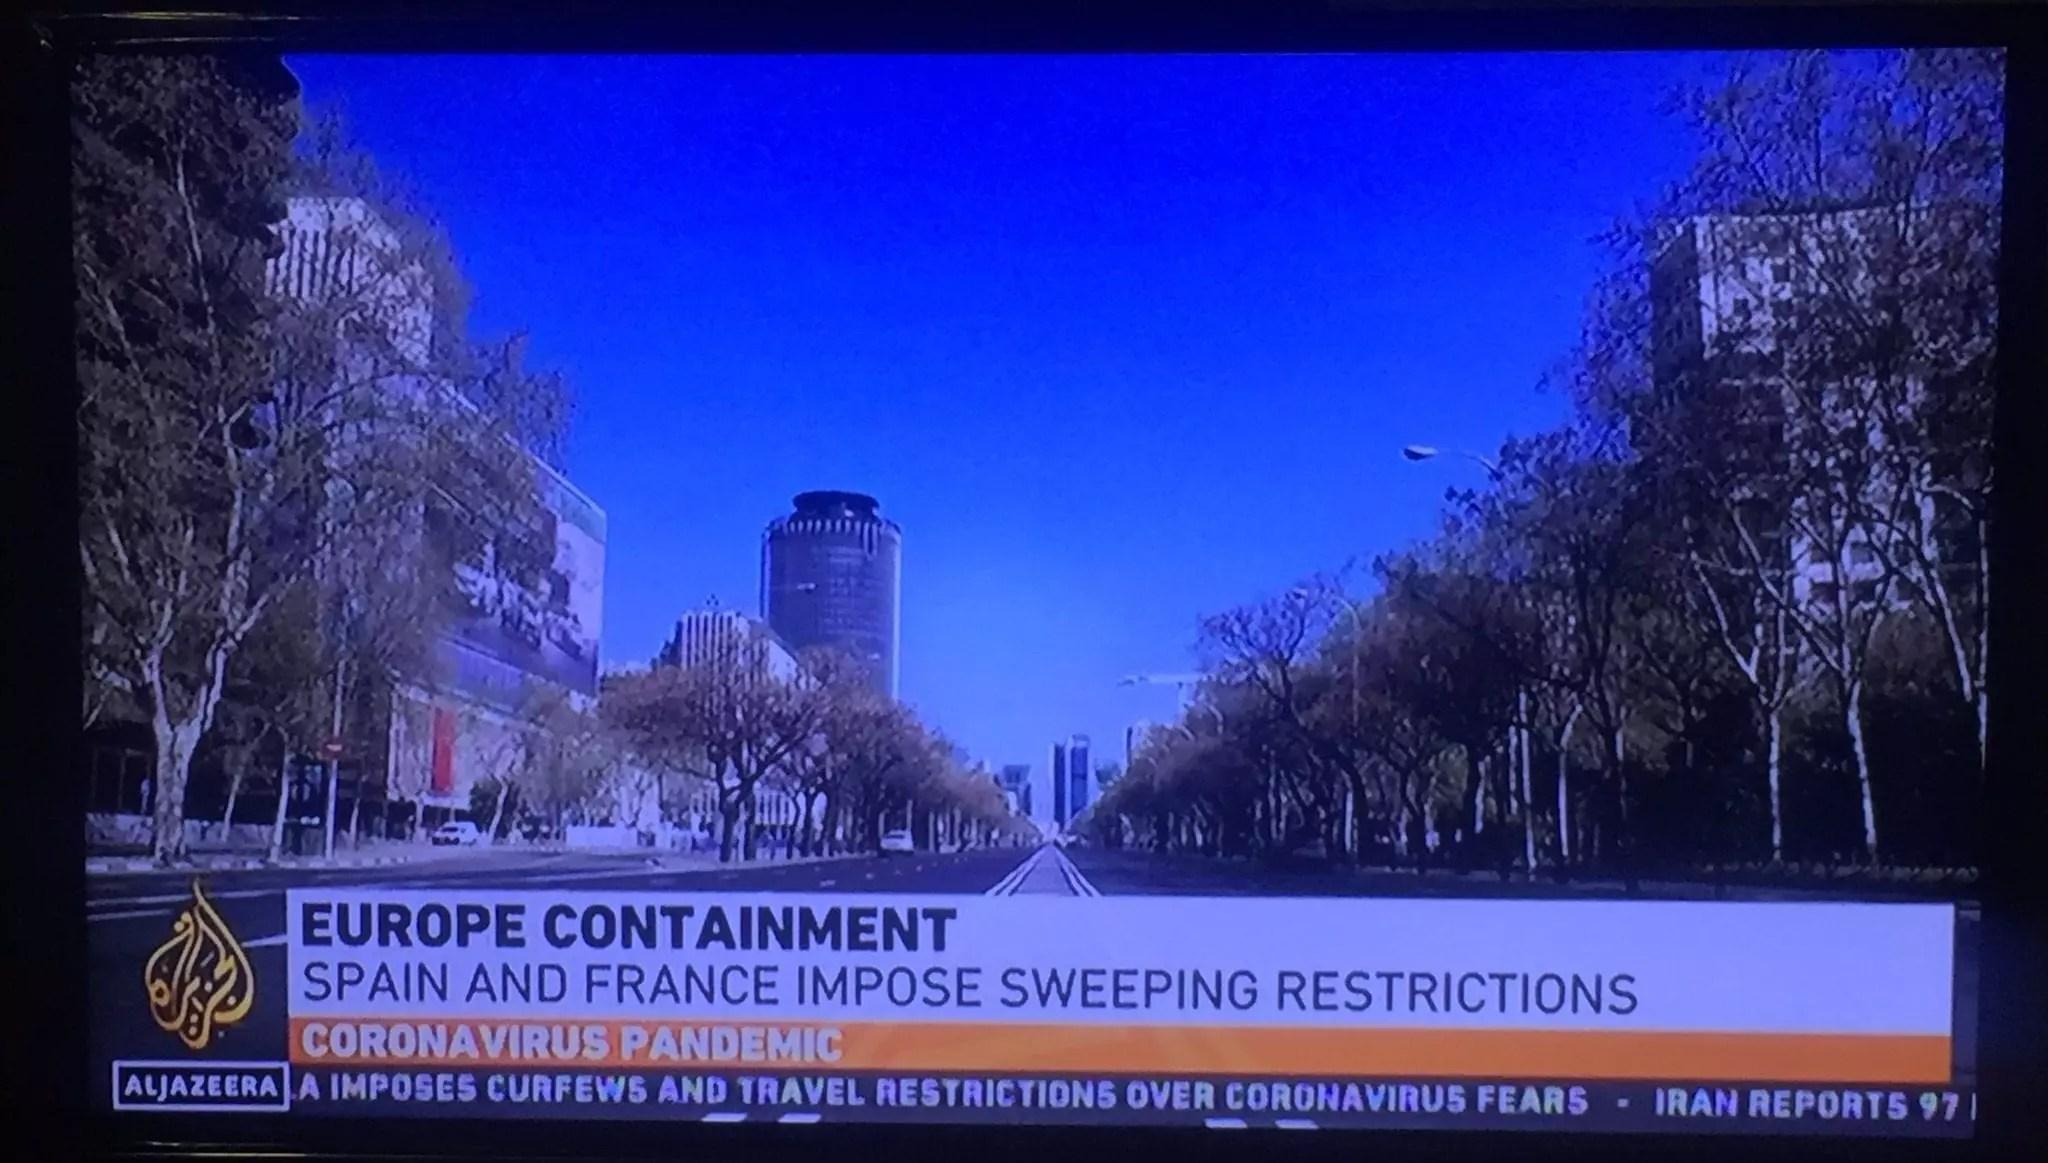 eNitiate | Aljazeera | Coronavirus | 15 Mar 2020 -1